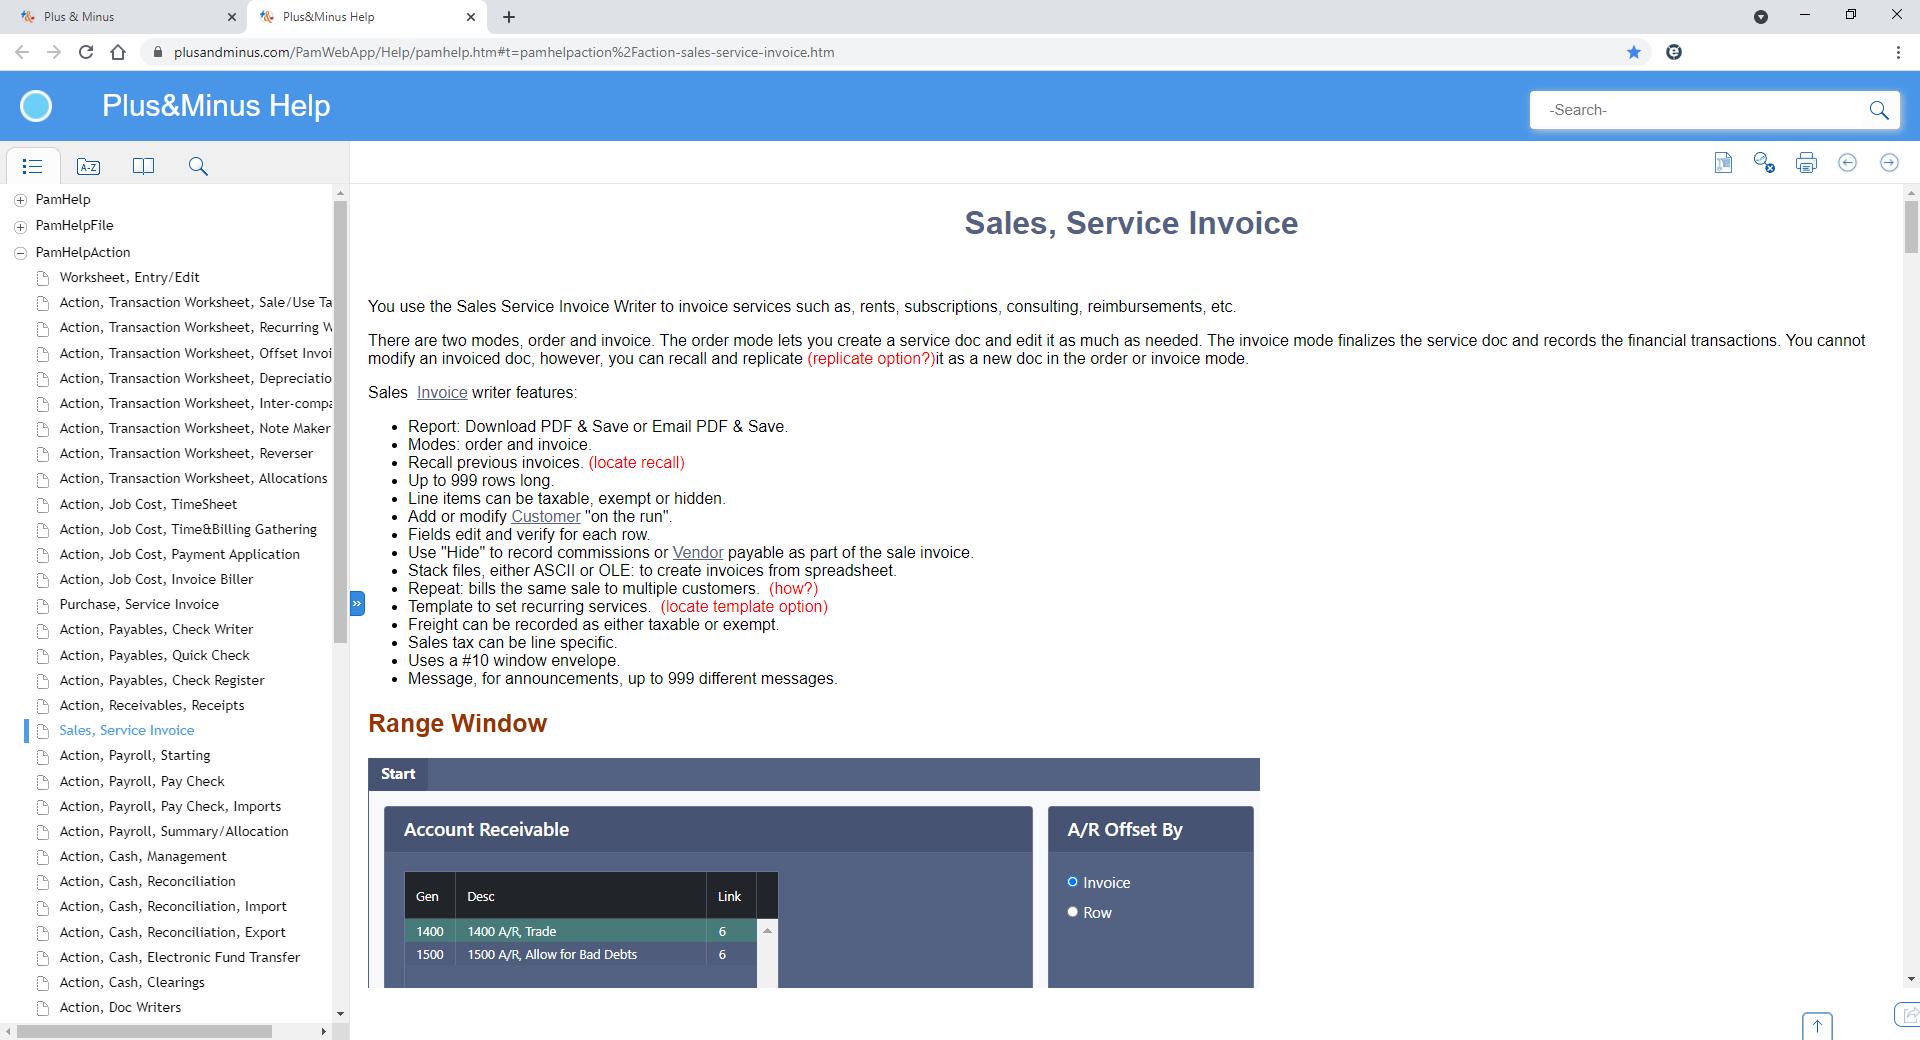 Plus & Minus Software - New Plus & Minus Web App Help